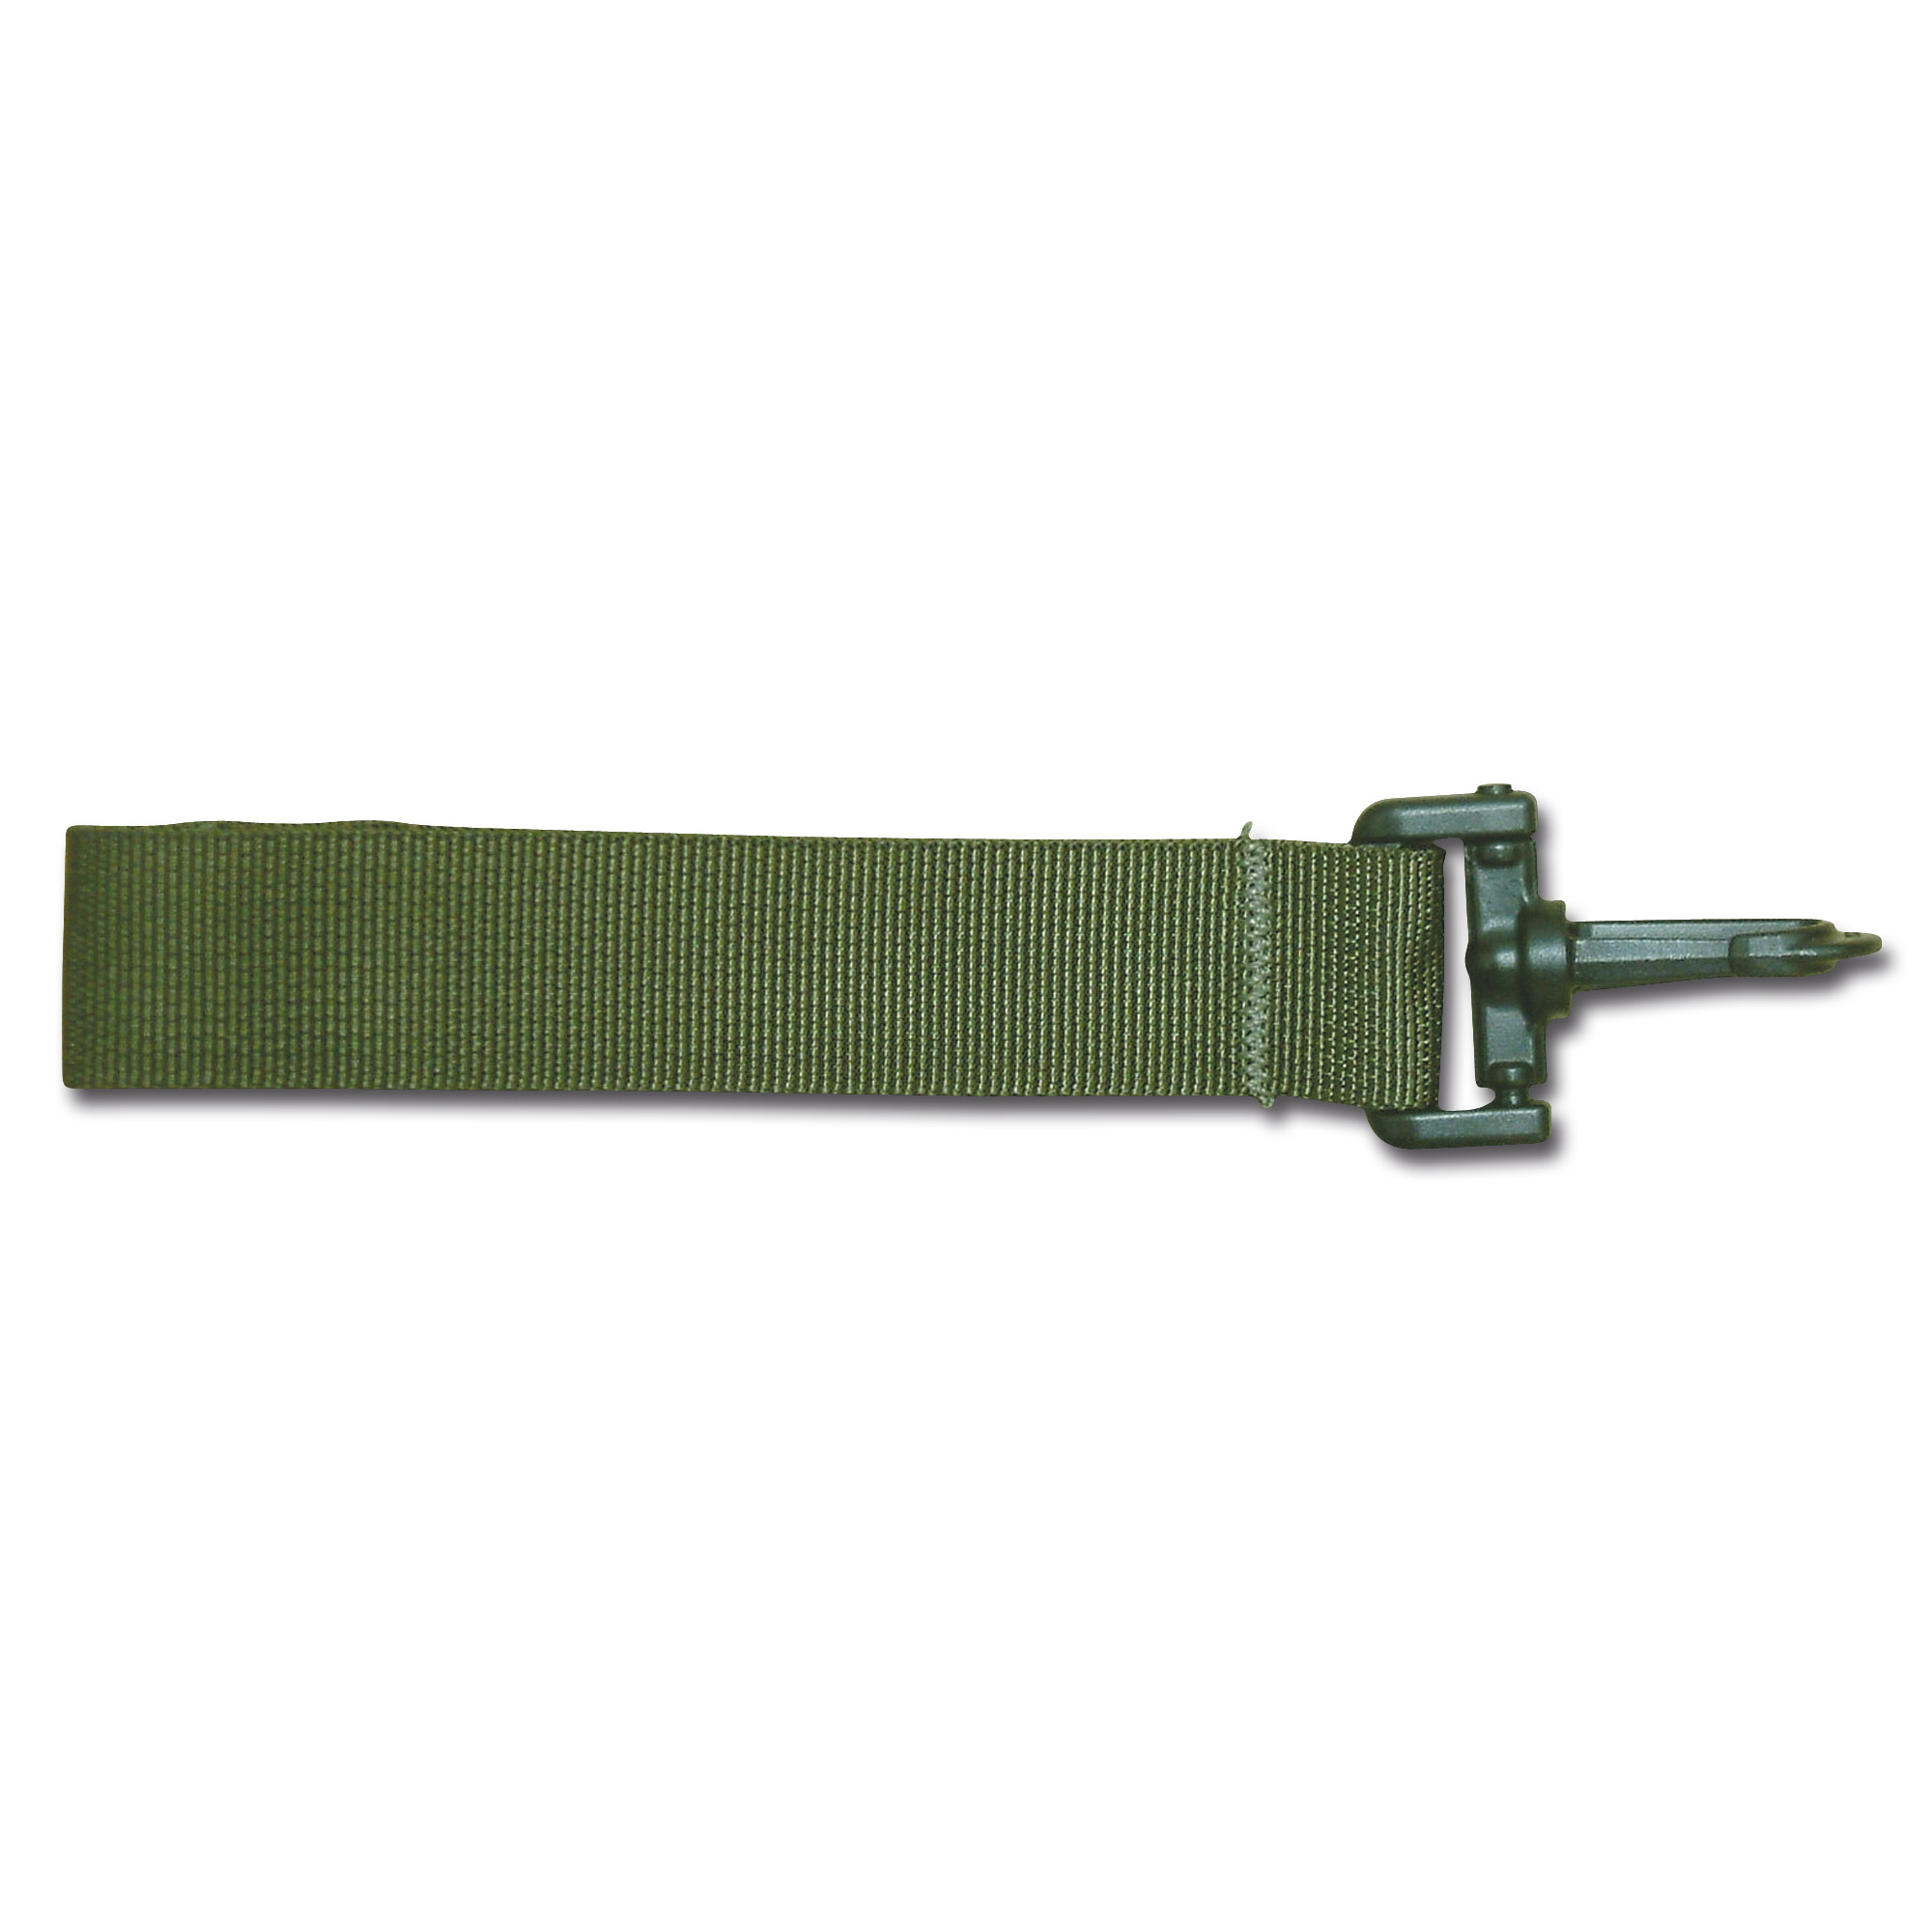 Koppelschlaufe TacGear oliv 10 cm